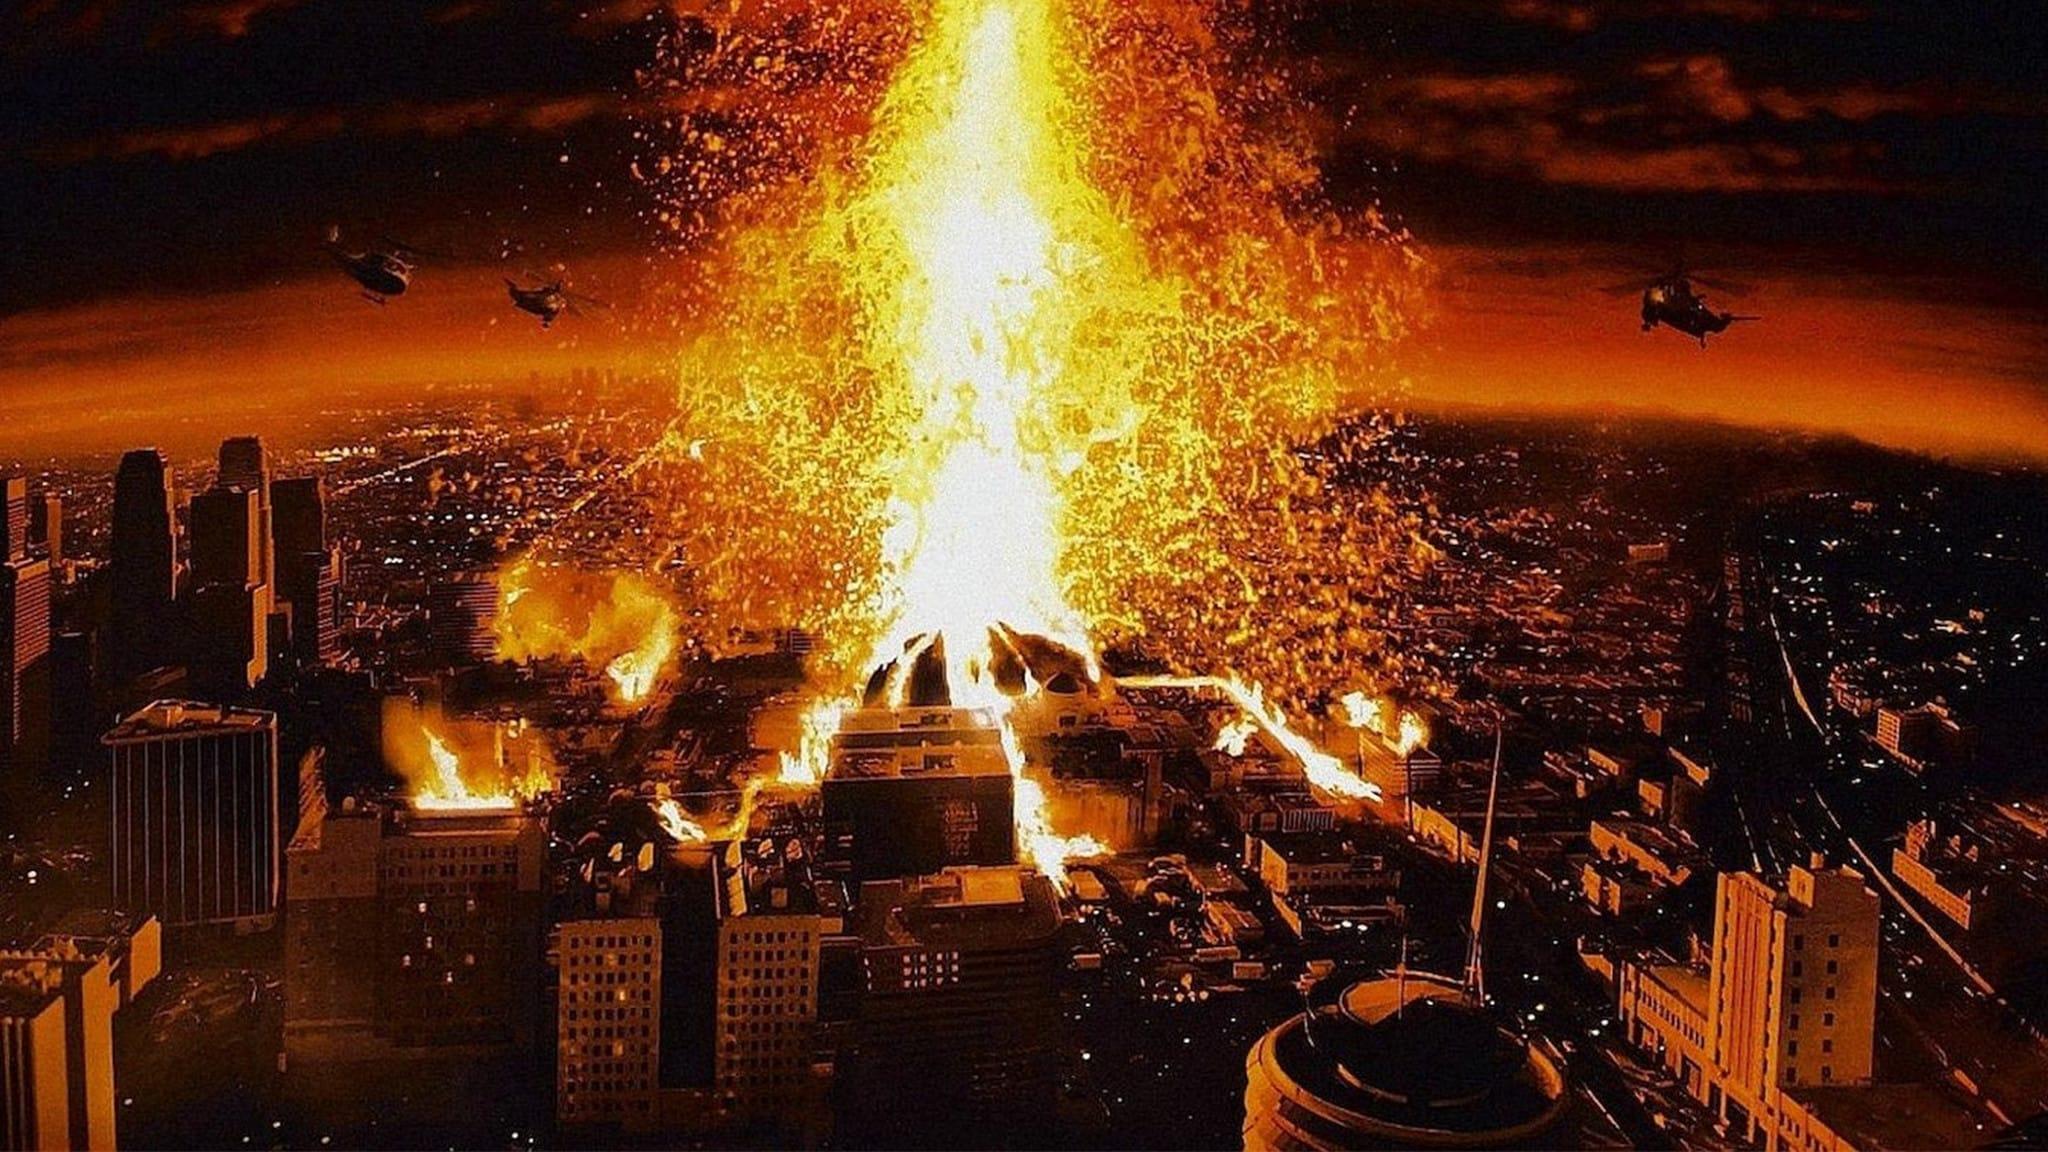 Rai Movie Vulcano - Los Angeles 1997